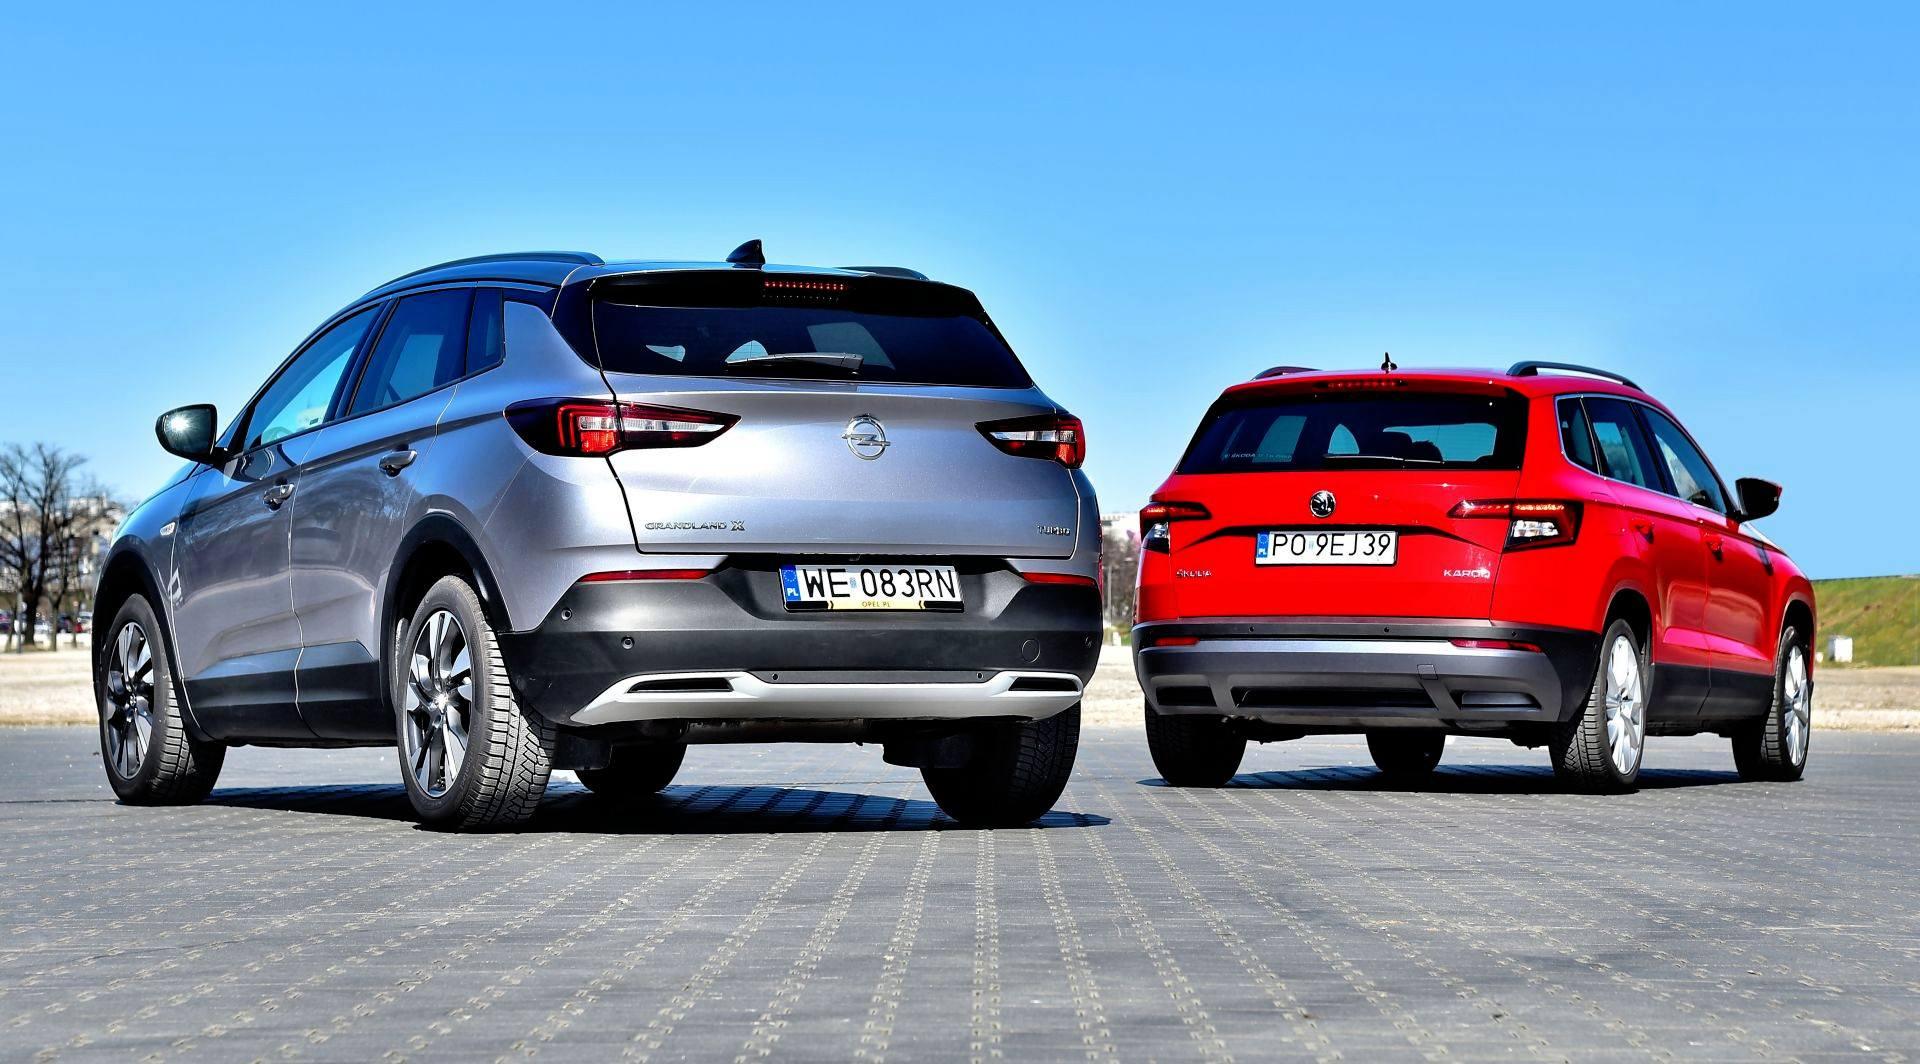 Porównanie Skoda Karoq Opel Grandland X